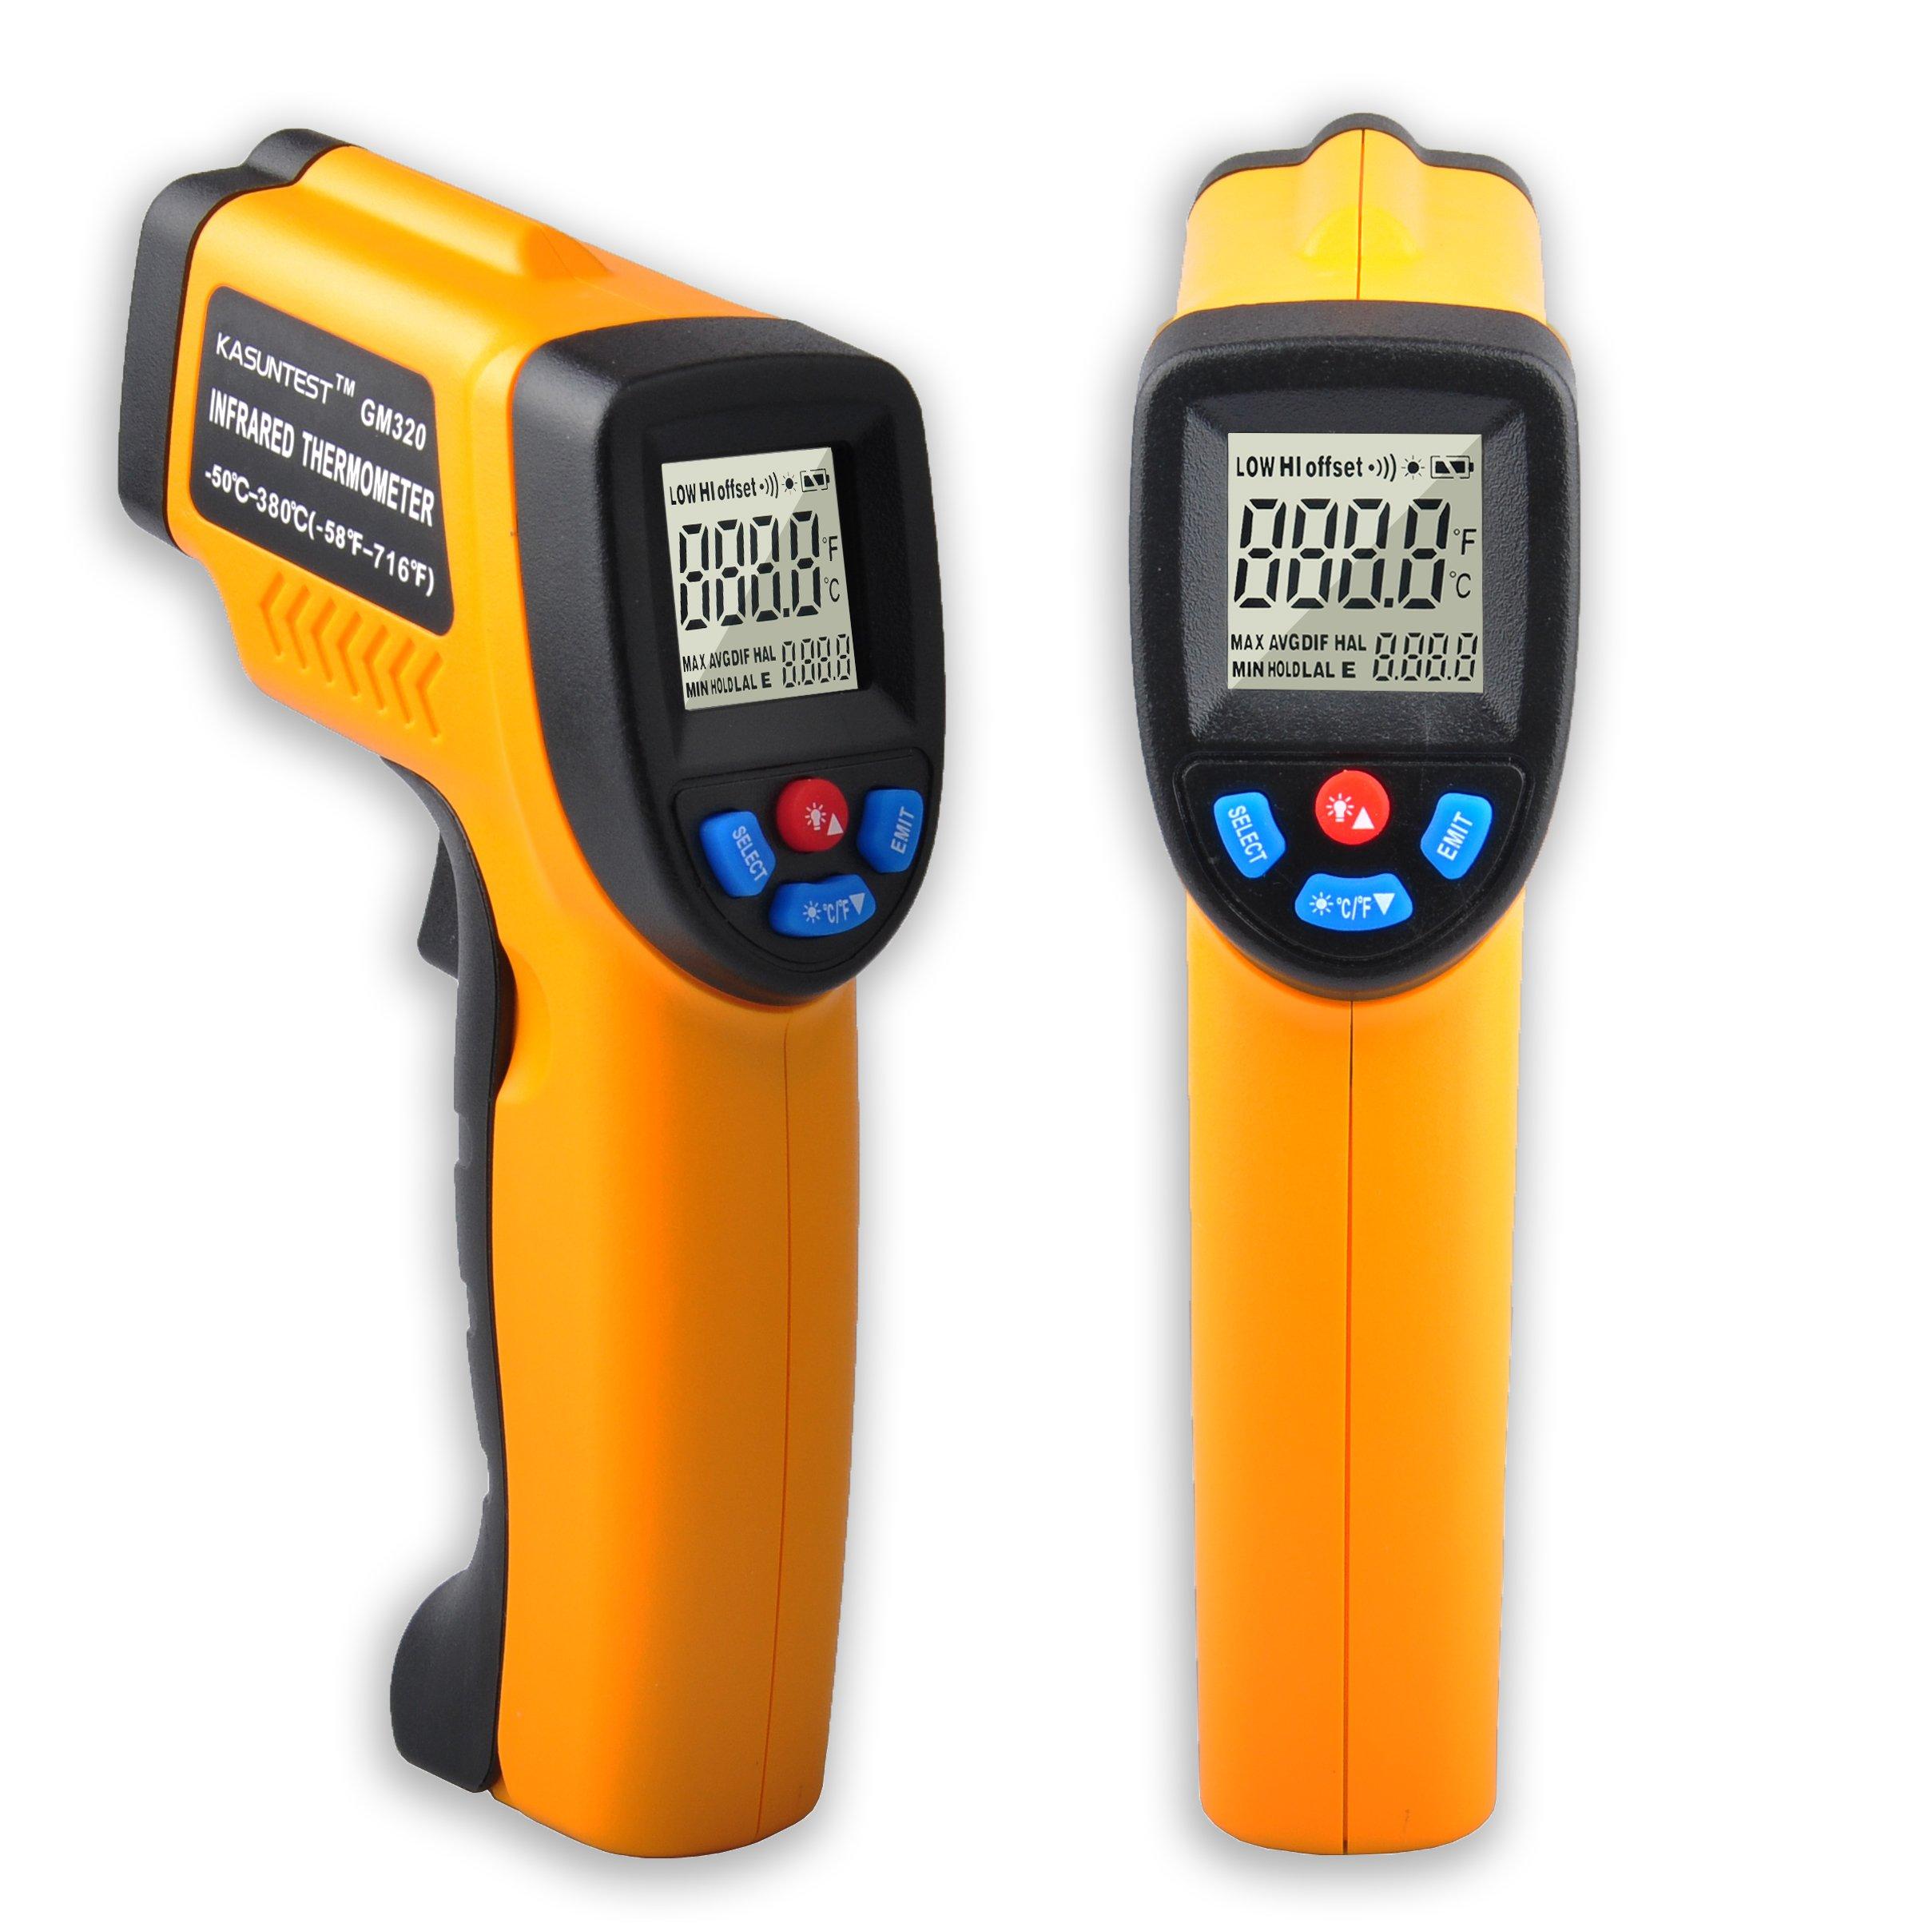 KASUNTEST Digital Photo Laser Tachometer Non Contact RPM Meter Digital Speedometer Speed Measurer Range 2.5-99999 RPM With Carrying Bag KT-900